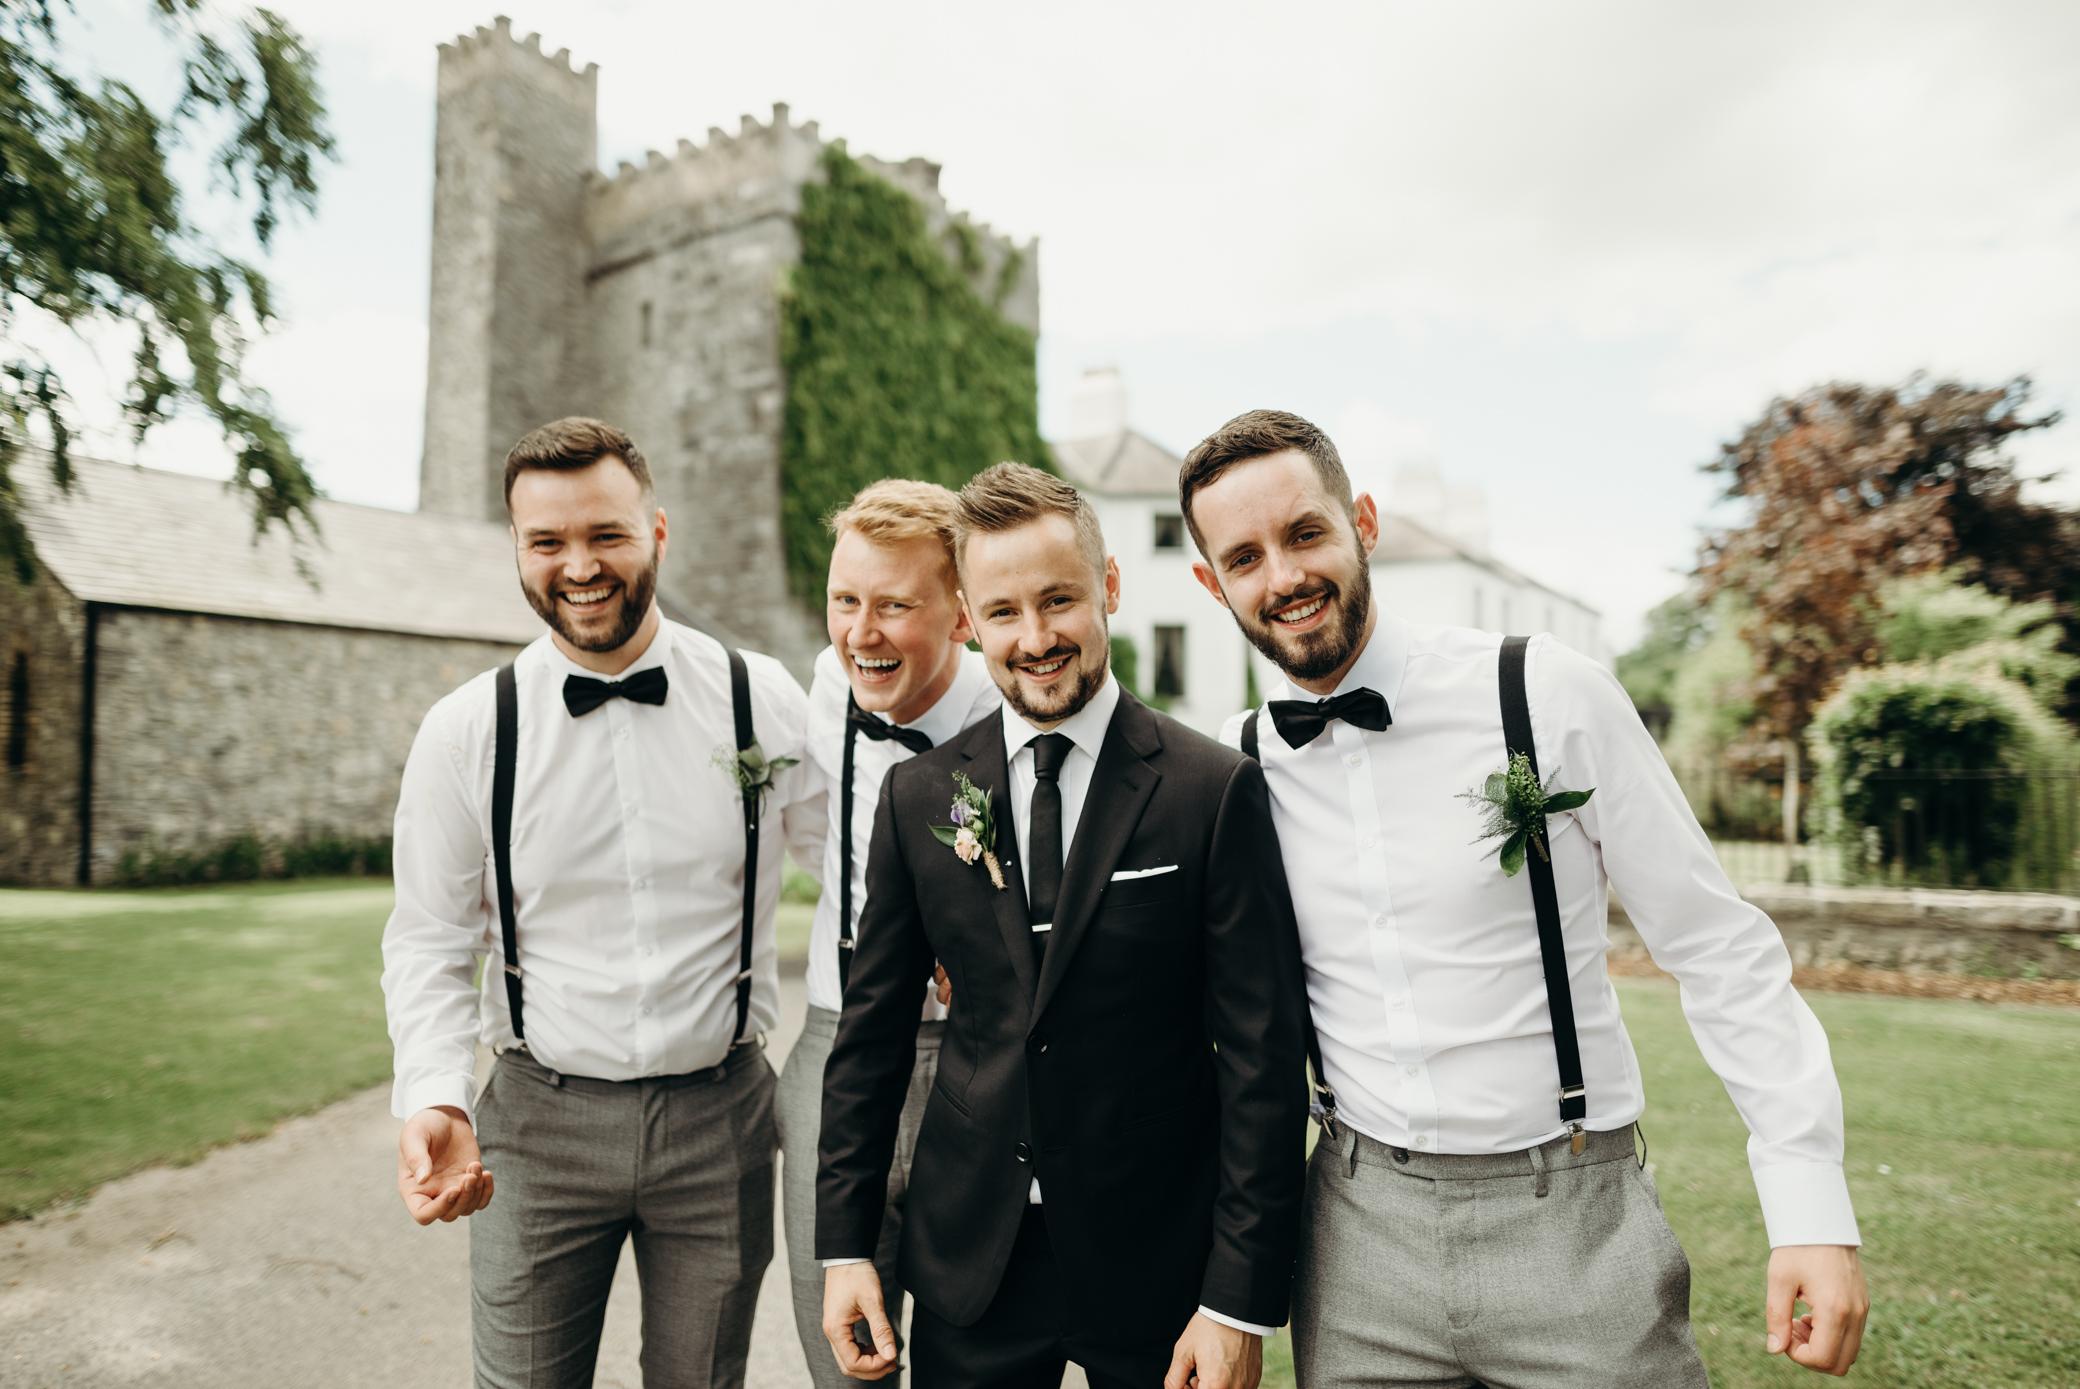 Alan&Naz- Barberstown Castle Wedding - Wedding photographer Ireland-93.jpg